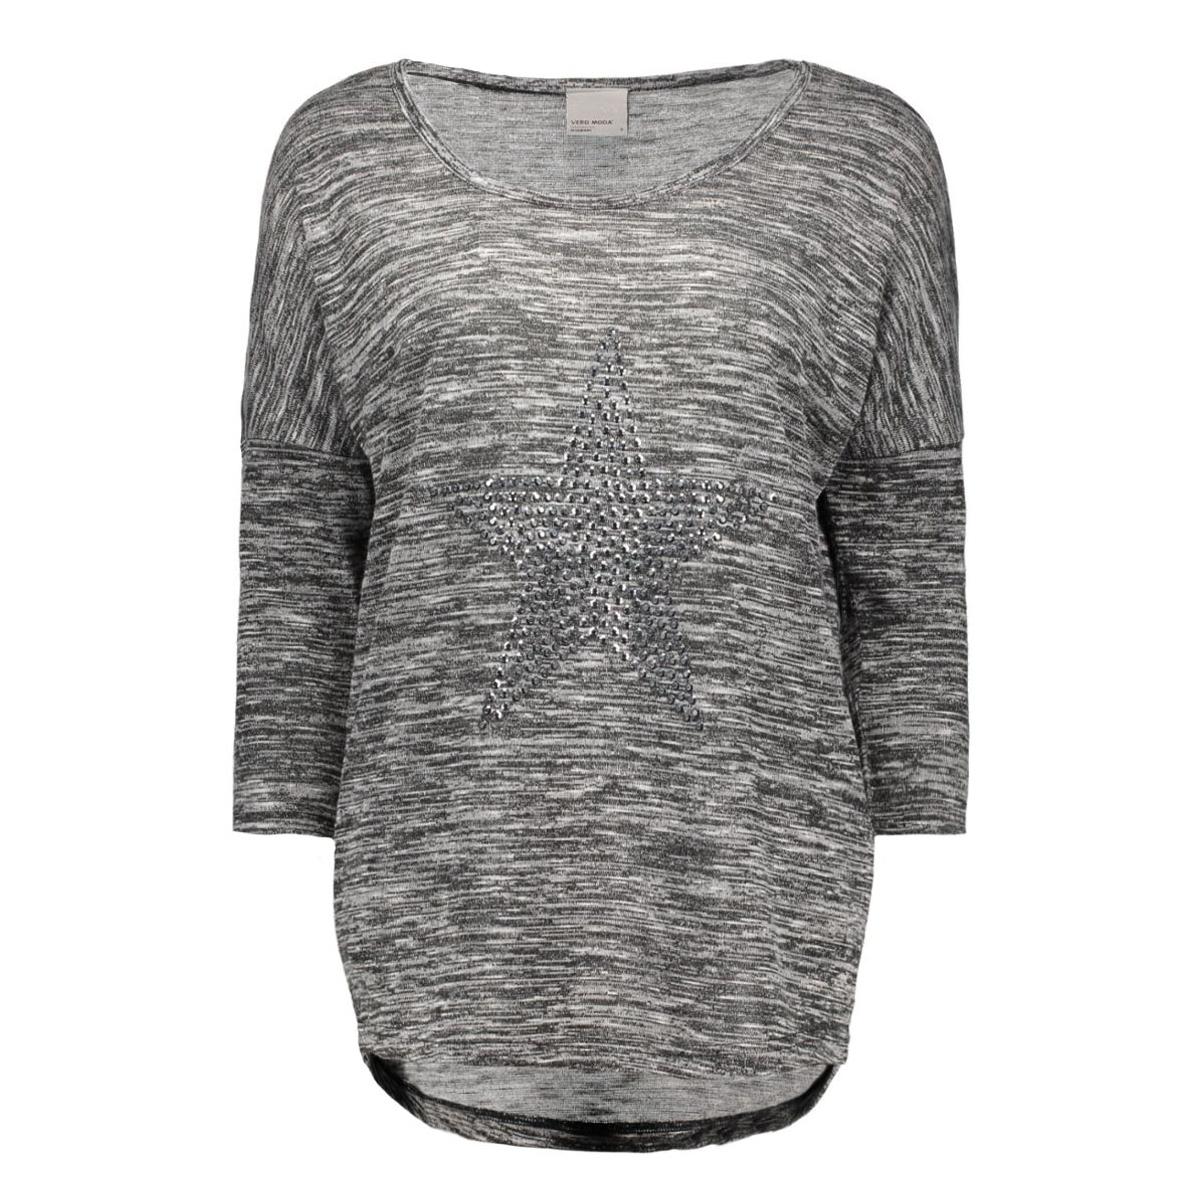 vmsabi star 3/4 top nfs 10162902 vero moda t-shirt dark grey melange